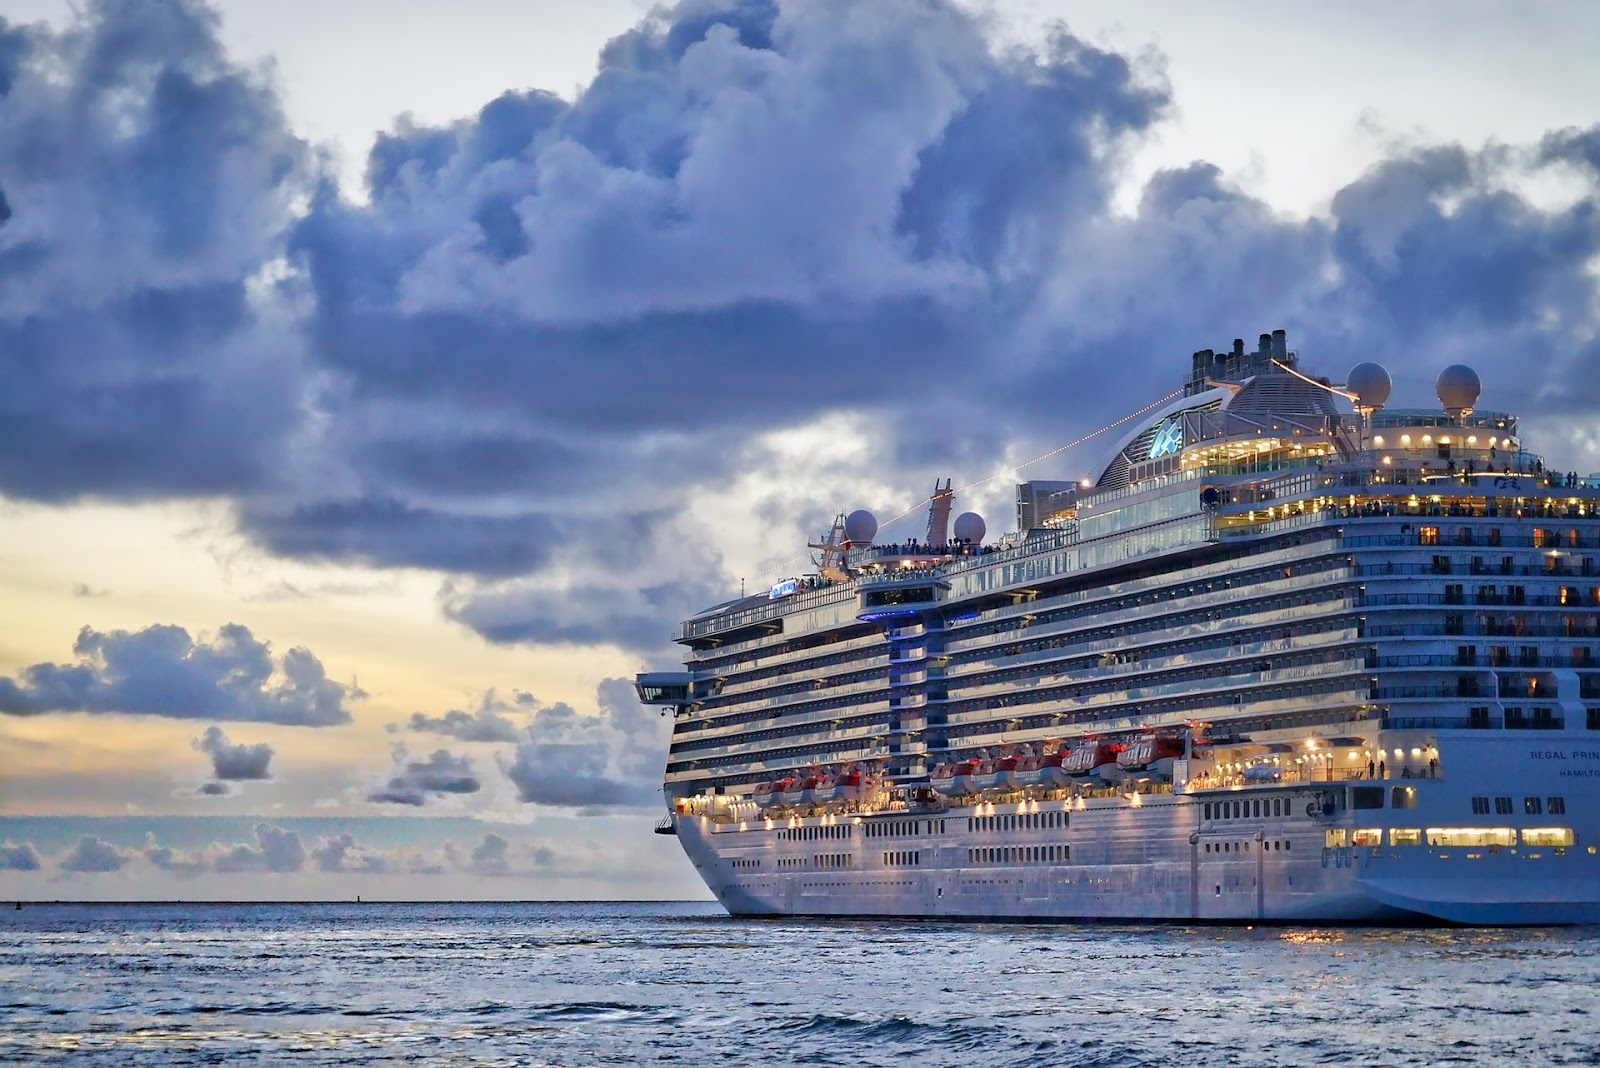 Hospitality: Reise- und Tourismusbranche